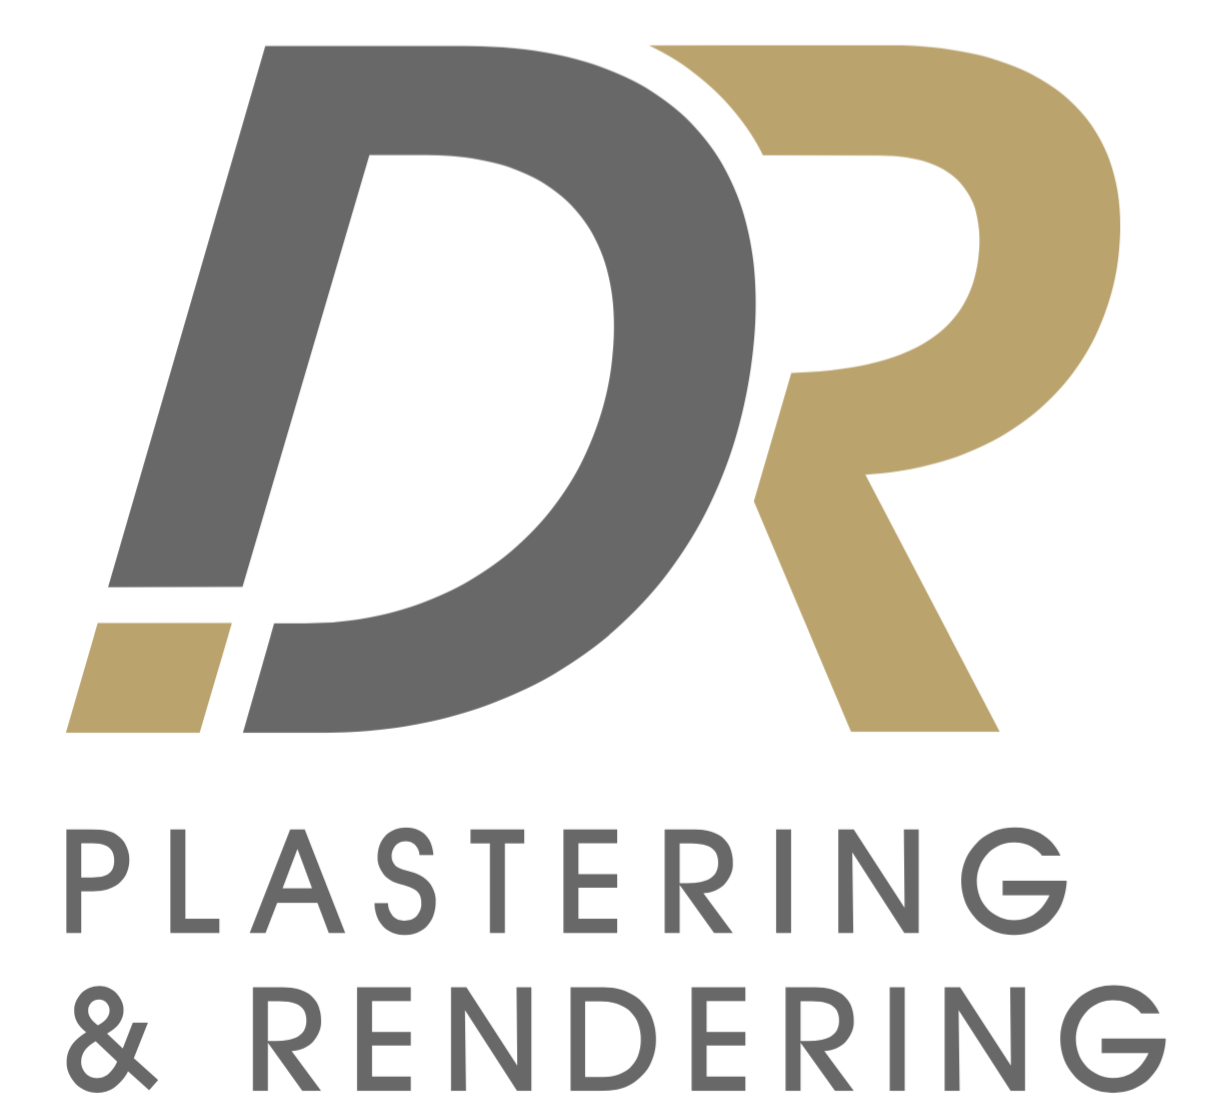 DR Plastering & Rendering Ltd